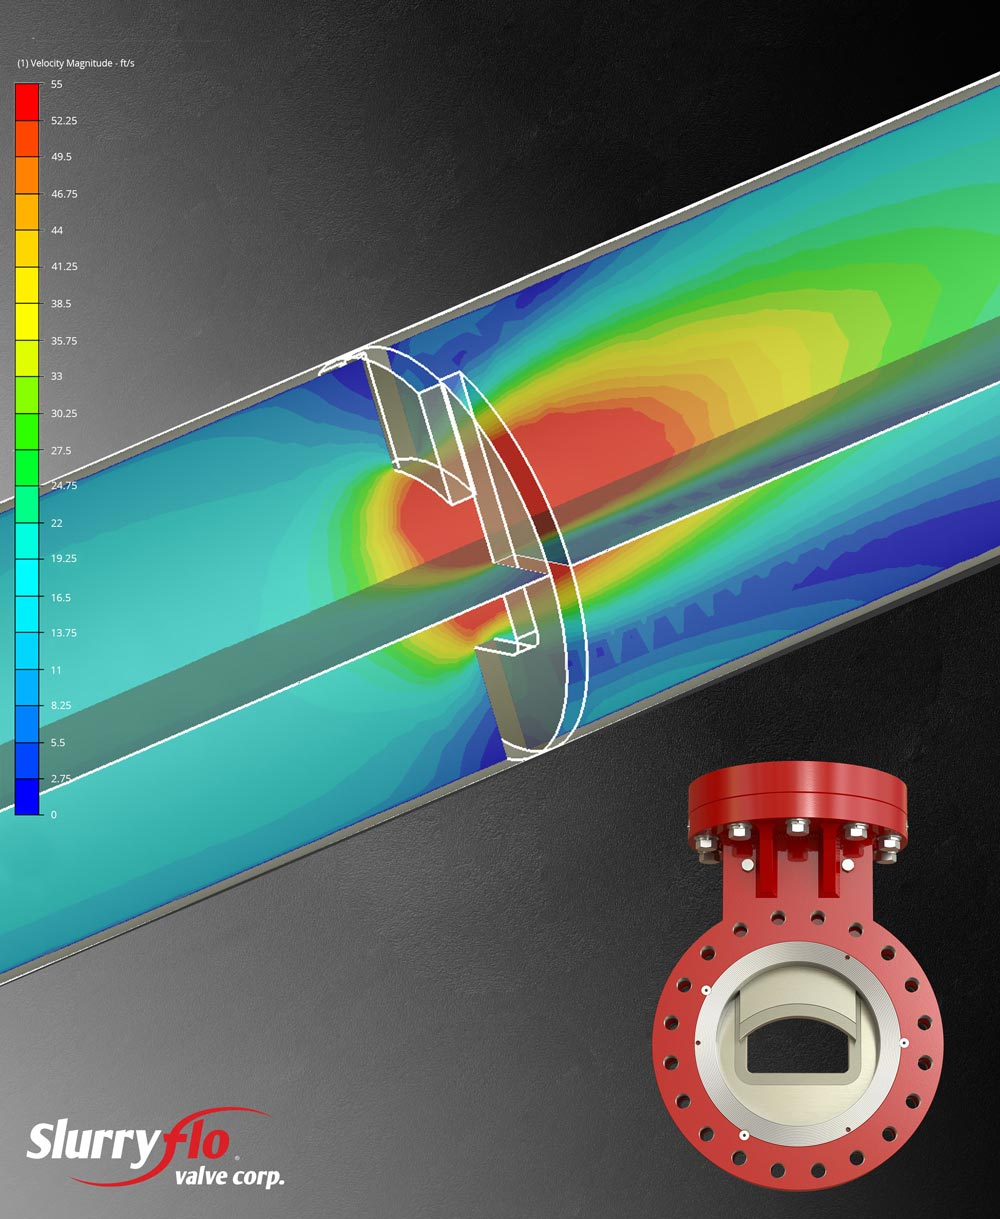 SlurryFlo engineers use CFD to simulate flow characteristics